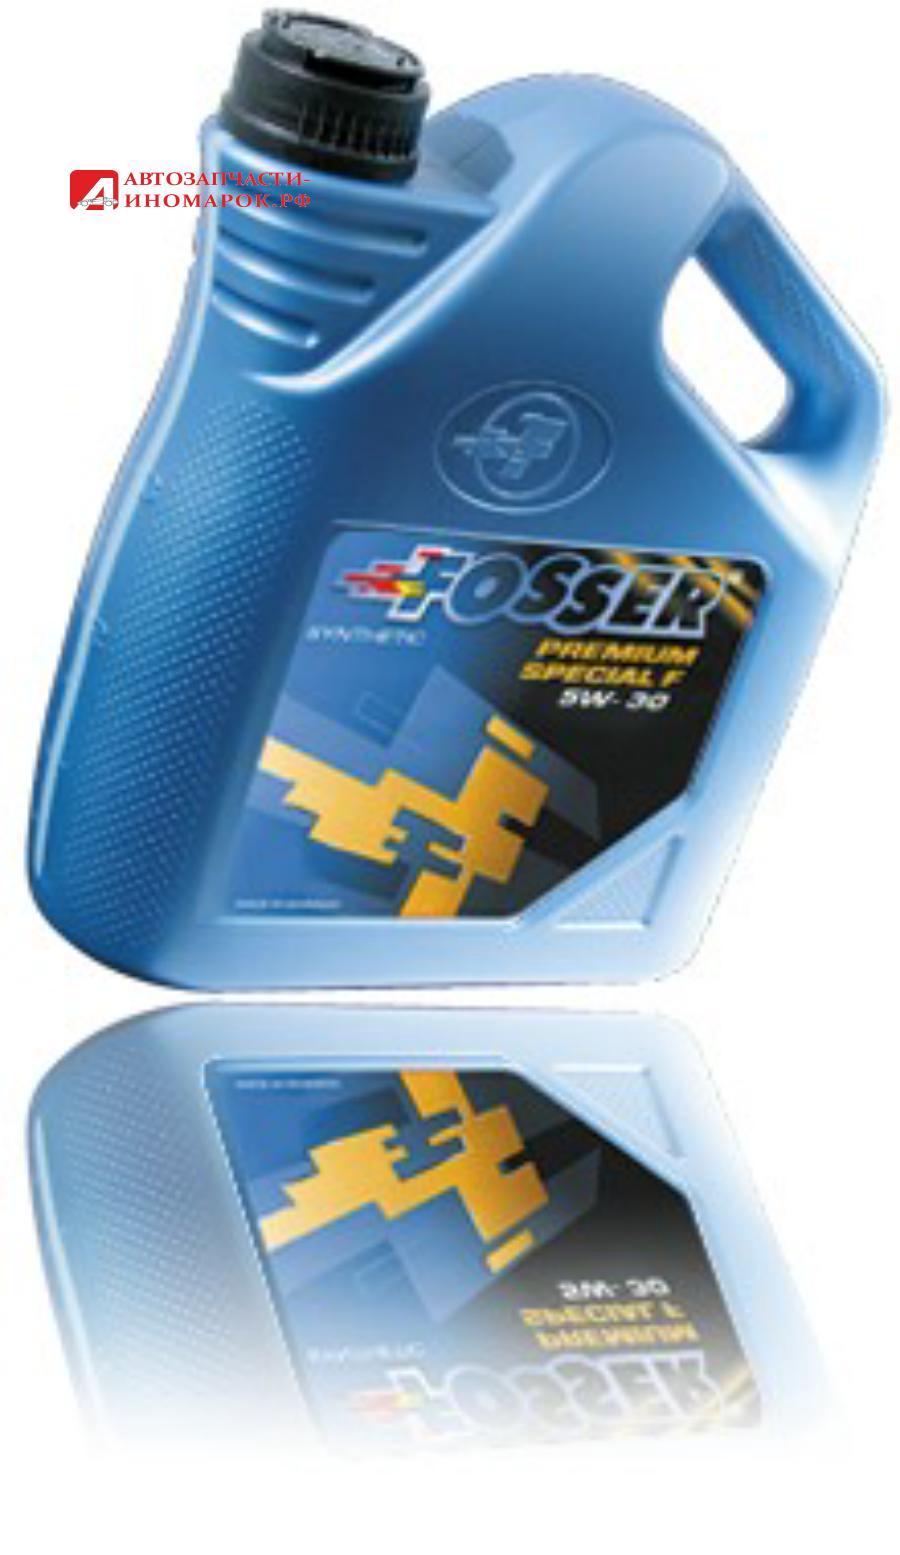 Масло моторное Fosser Premium Special F 5W-30 (1л)